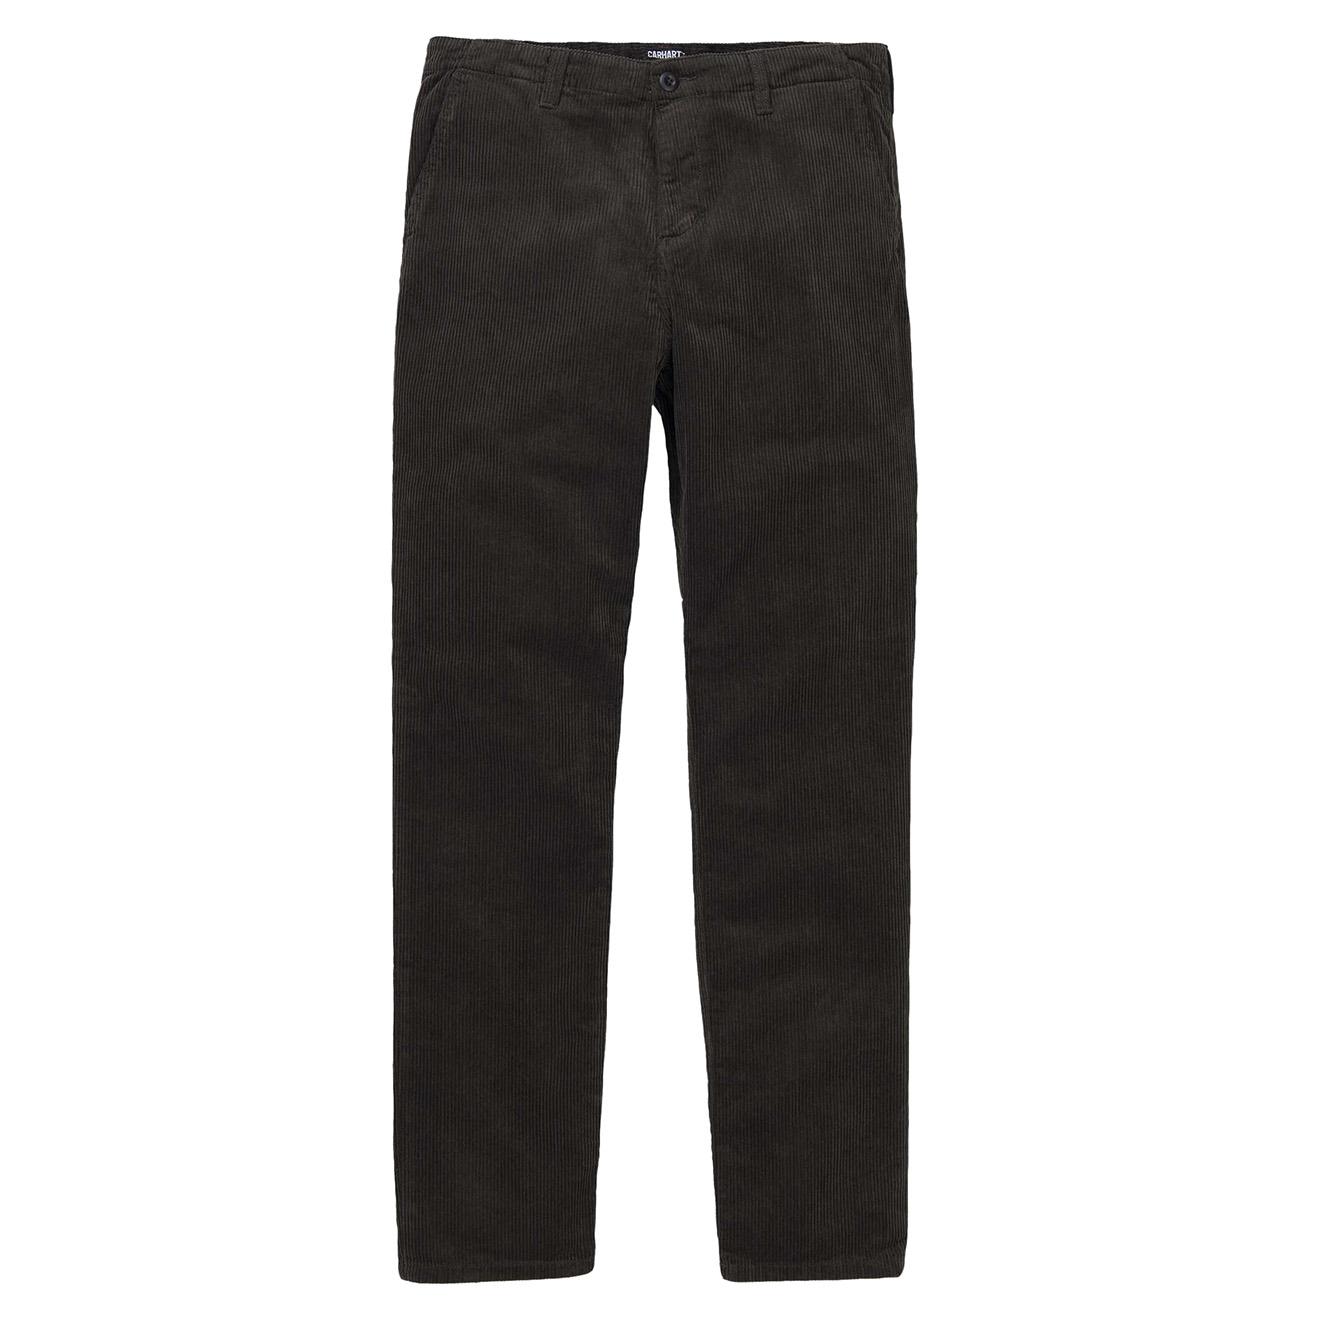 Carhartt Club Pant Regular Leg Tobacco Rinsed | The ...